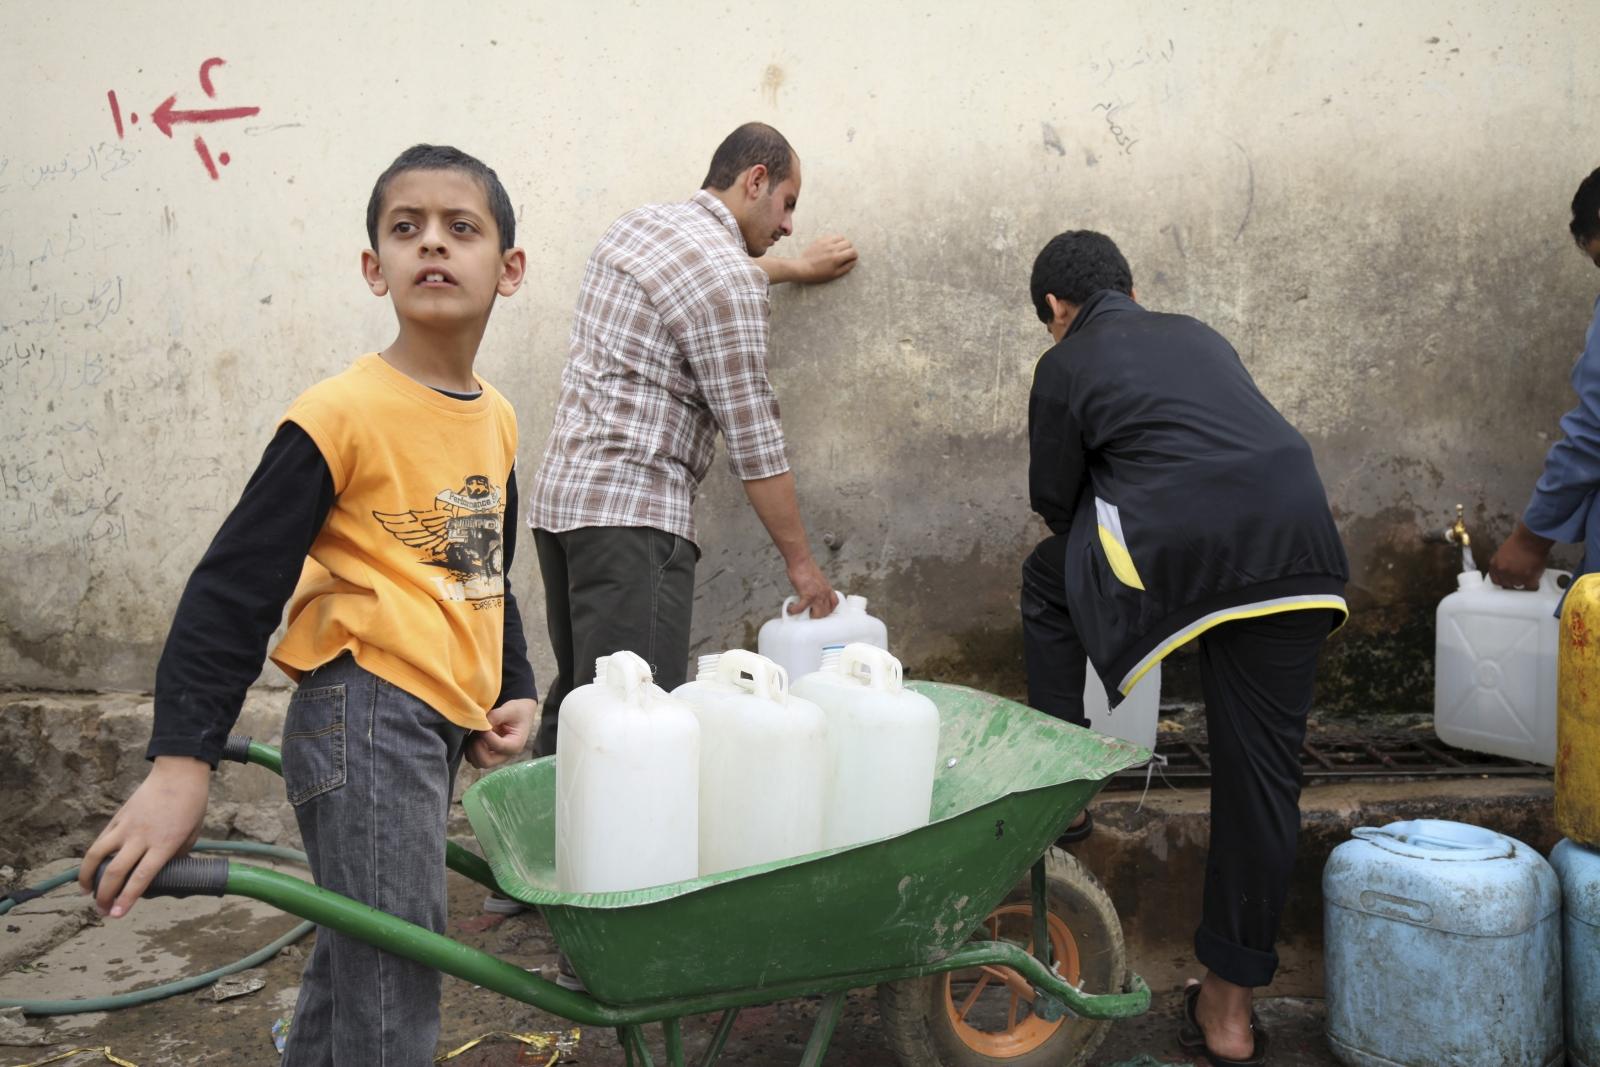 Yemen water fuel shortage